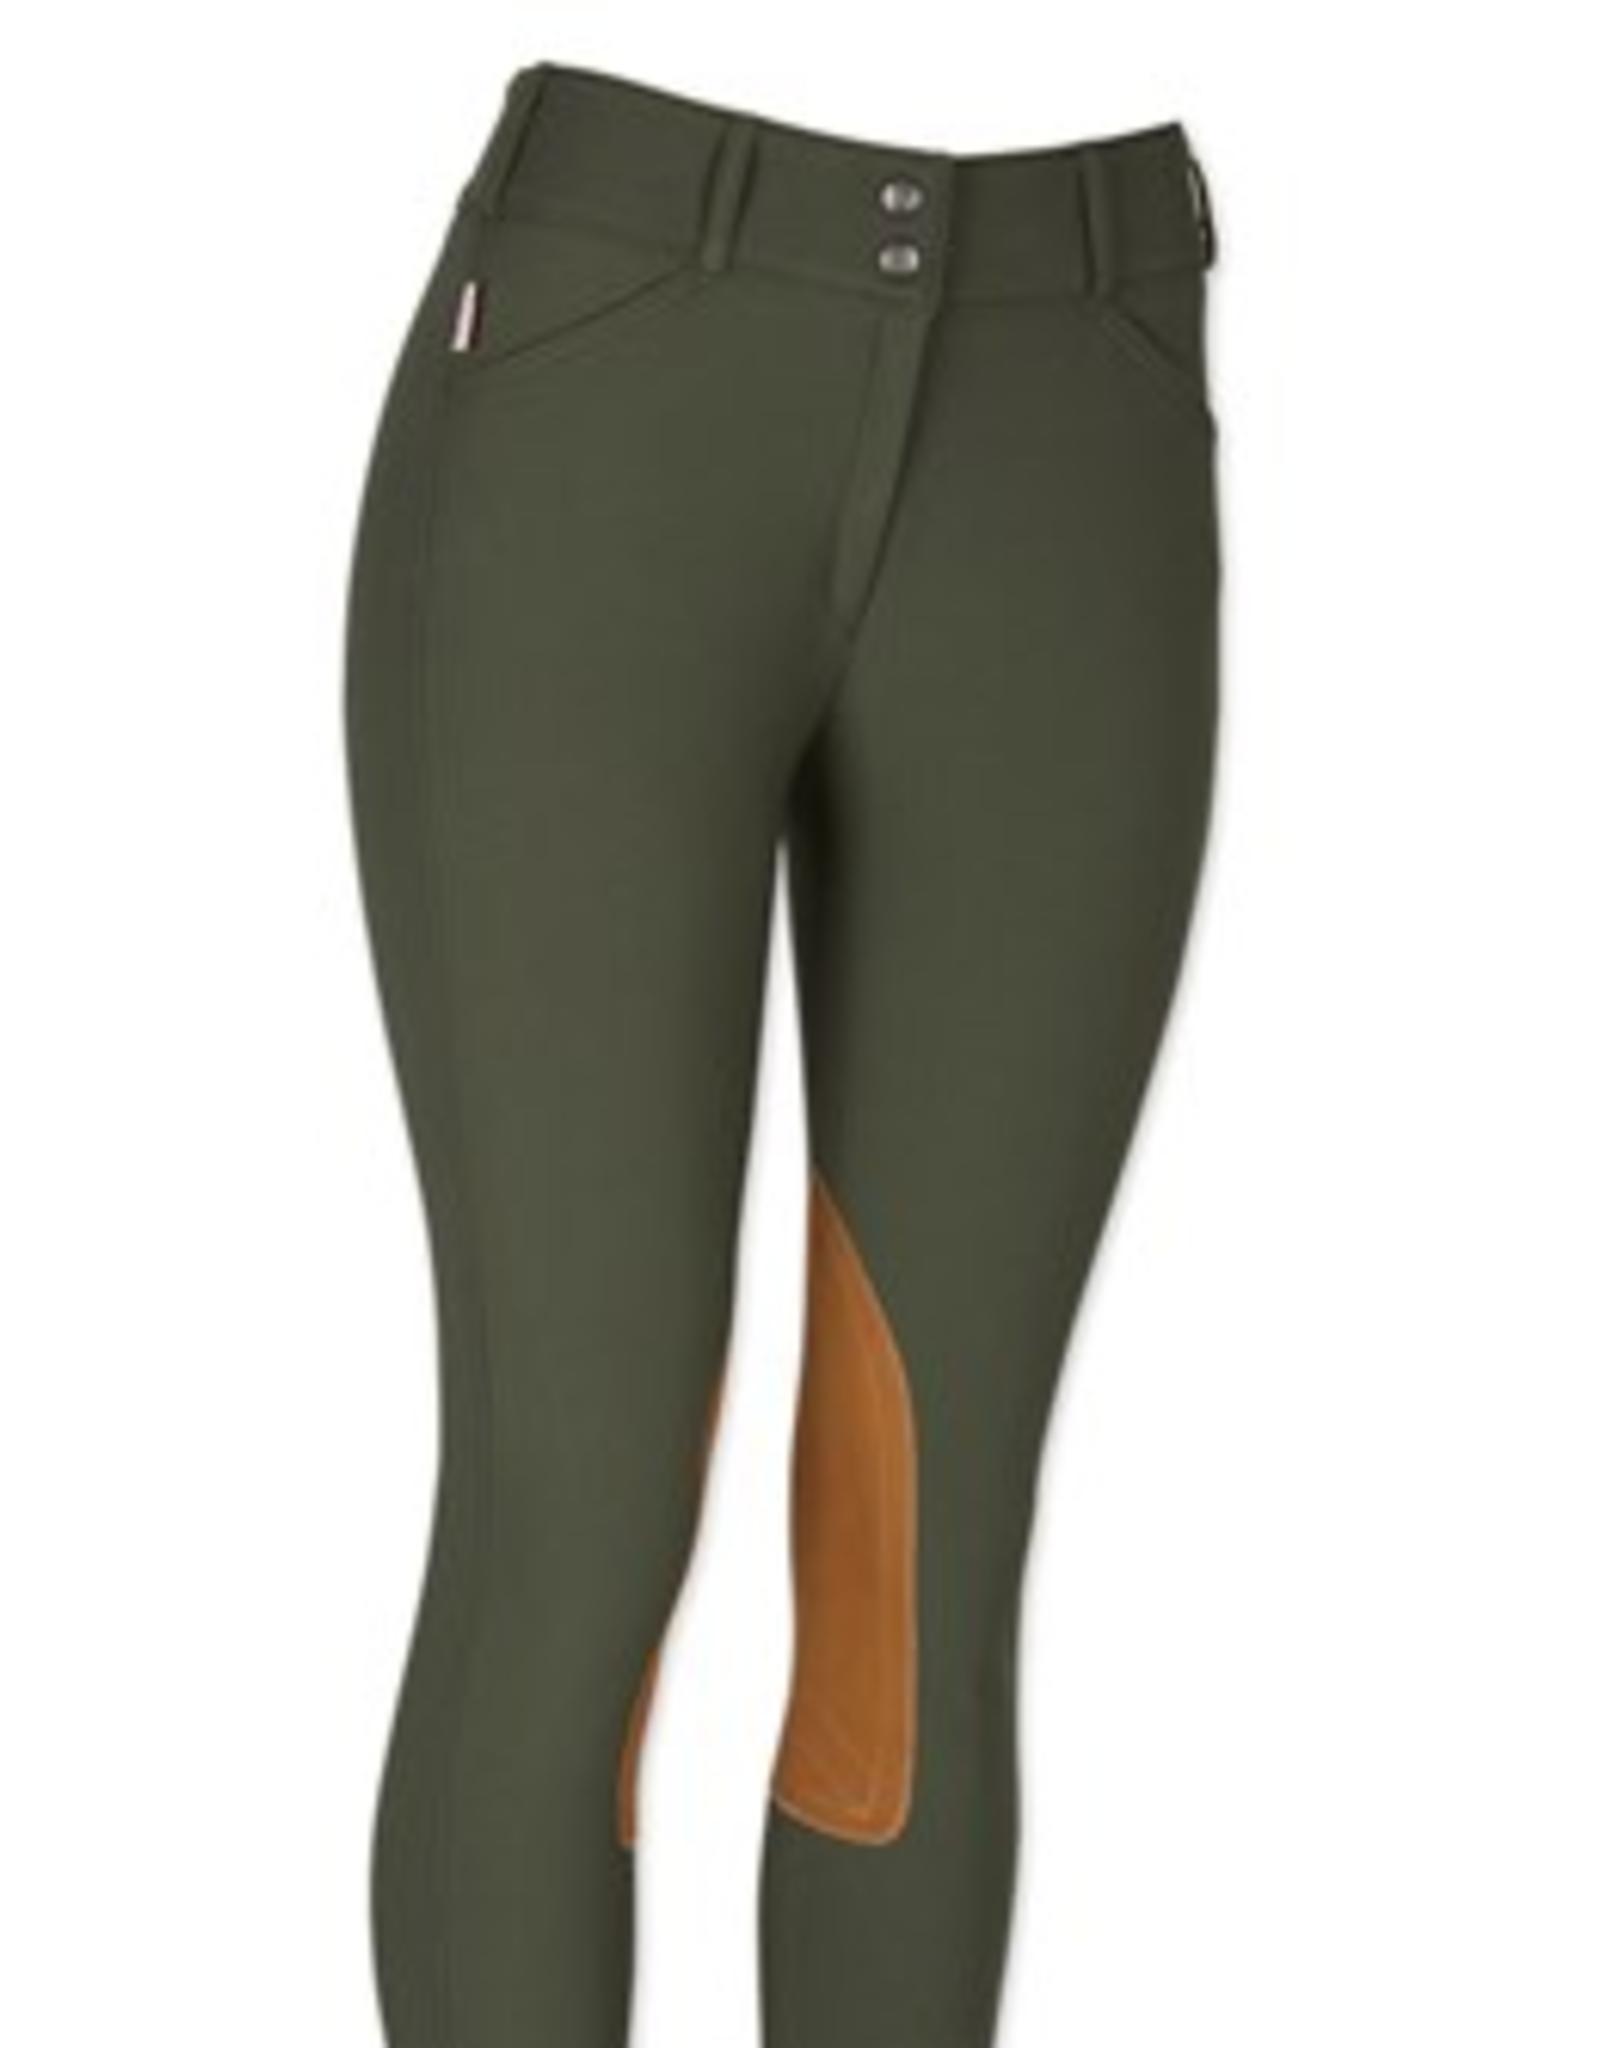 Tailored Sportsman Ladies' Trophy Hunter Sock Bottom Breeches